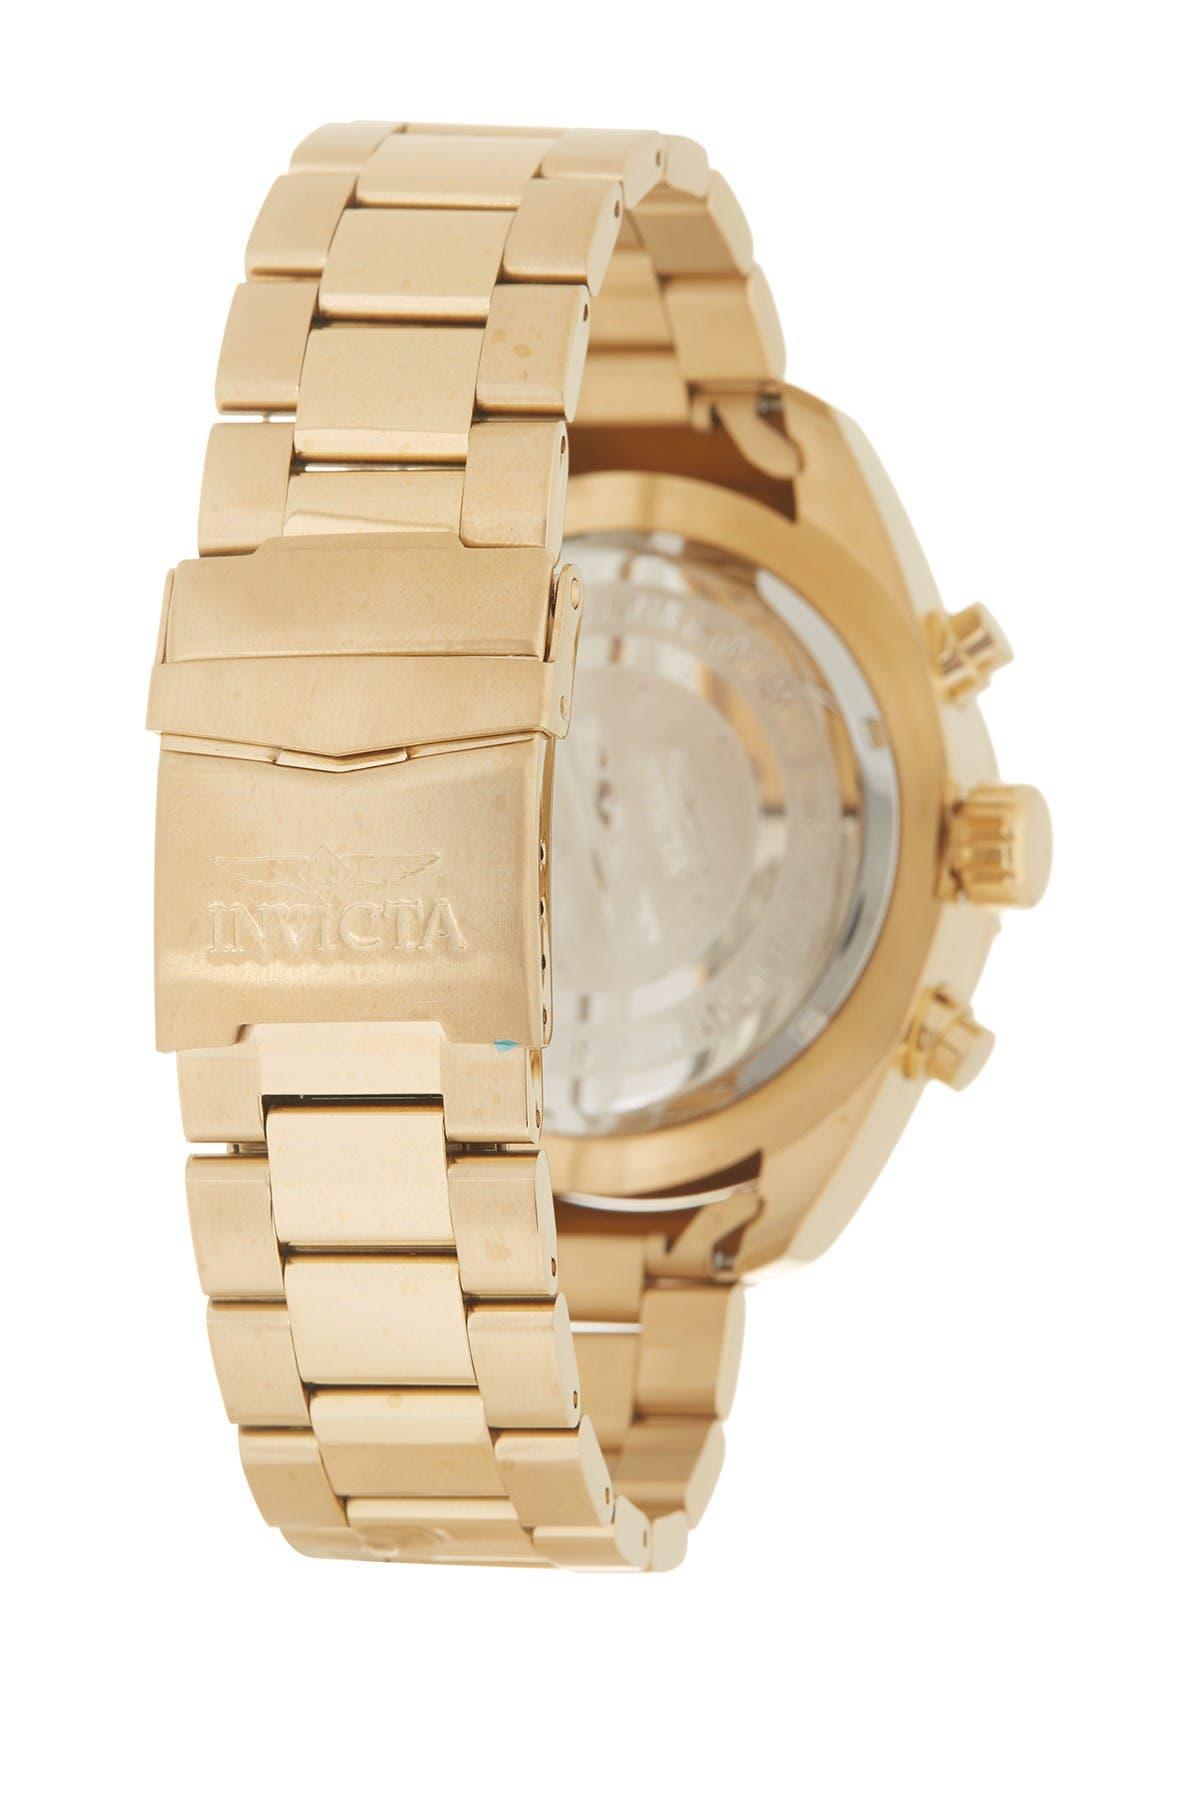 Image of Invicta Men's Bolt Chronograph Bracelet Watch, 52mm